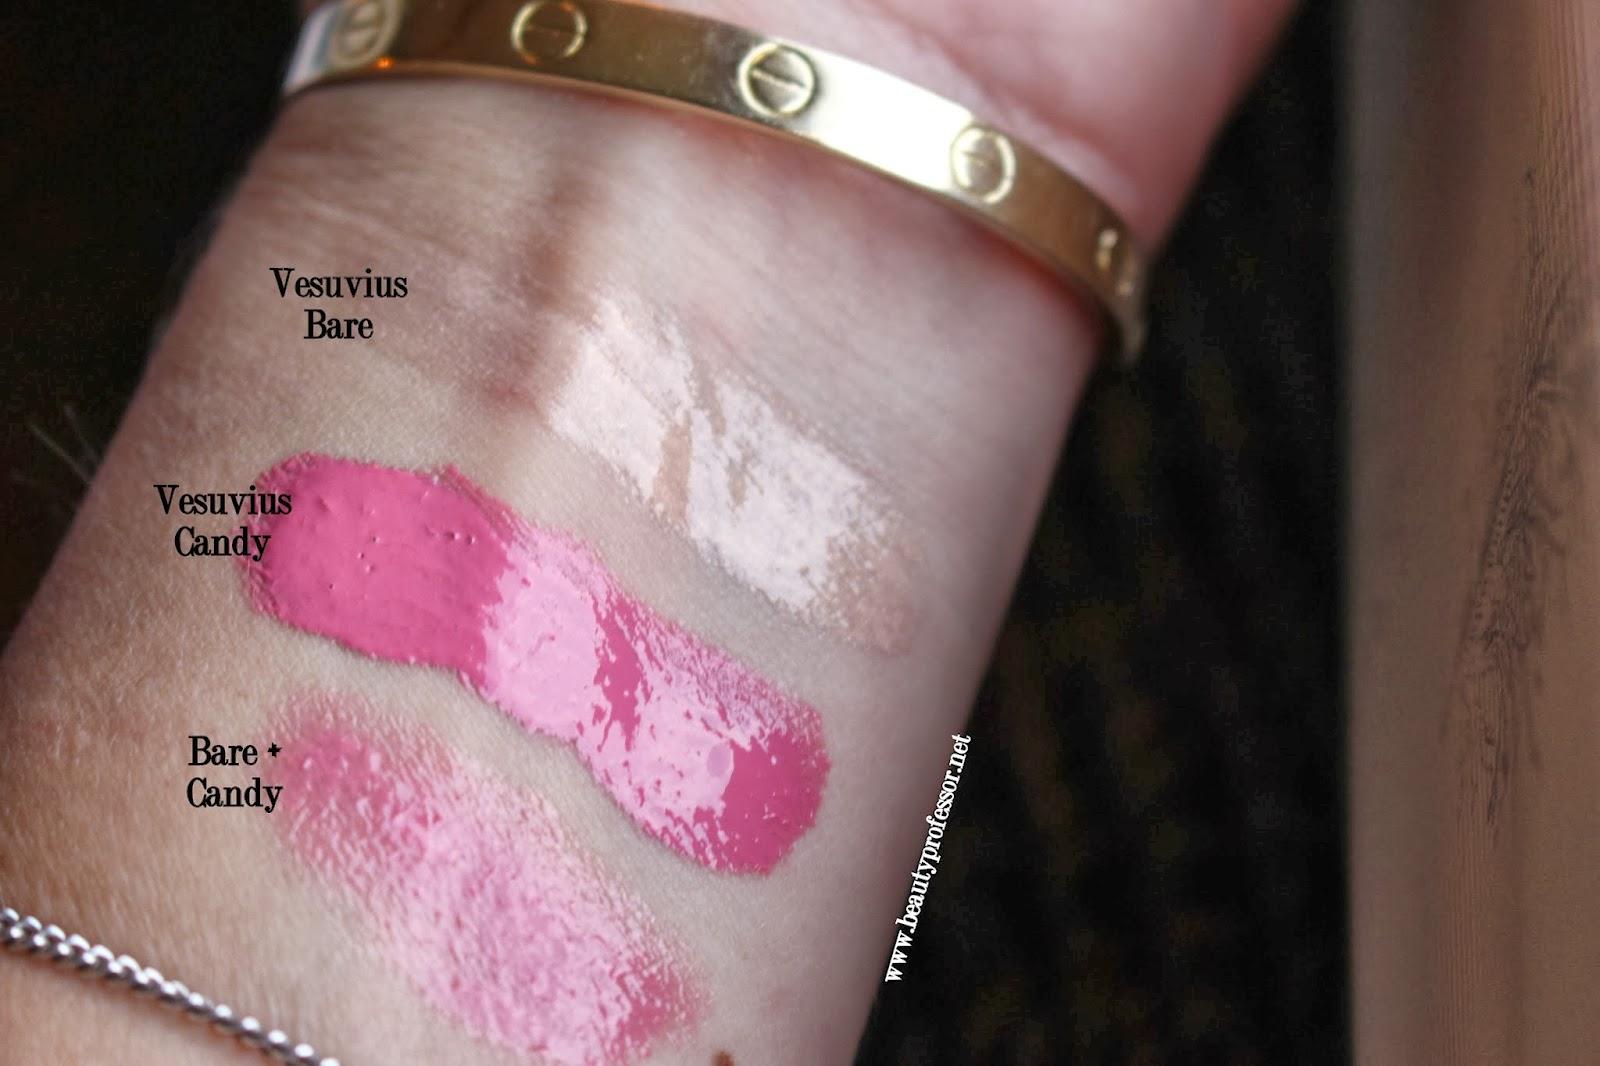 Vesuvius Liquid Lipstick by Lipstick Queen #7